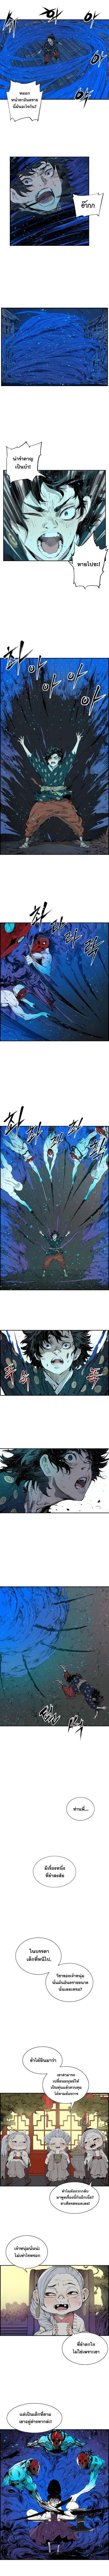 Sword Sheath's Child - หน้า 5